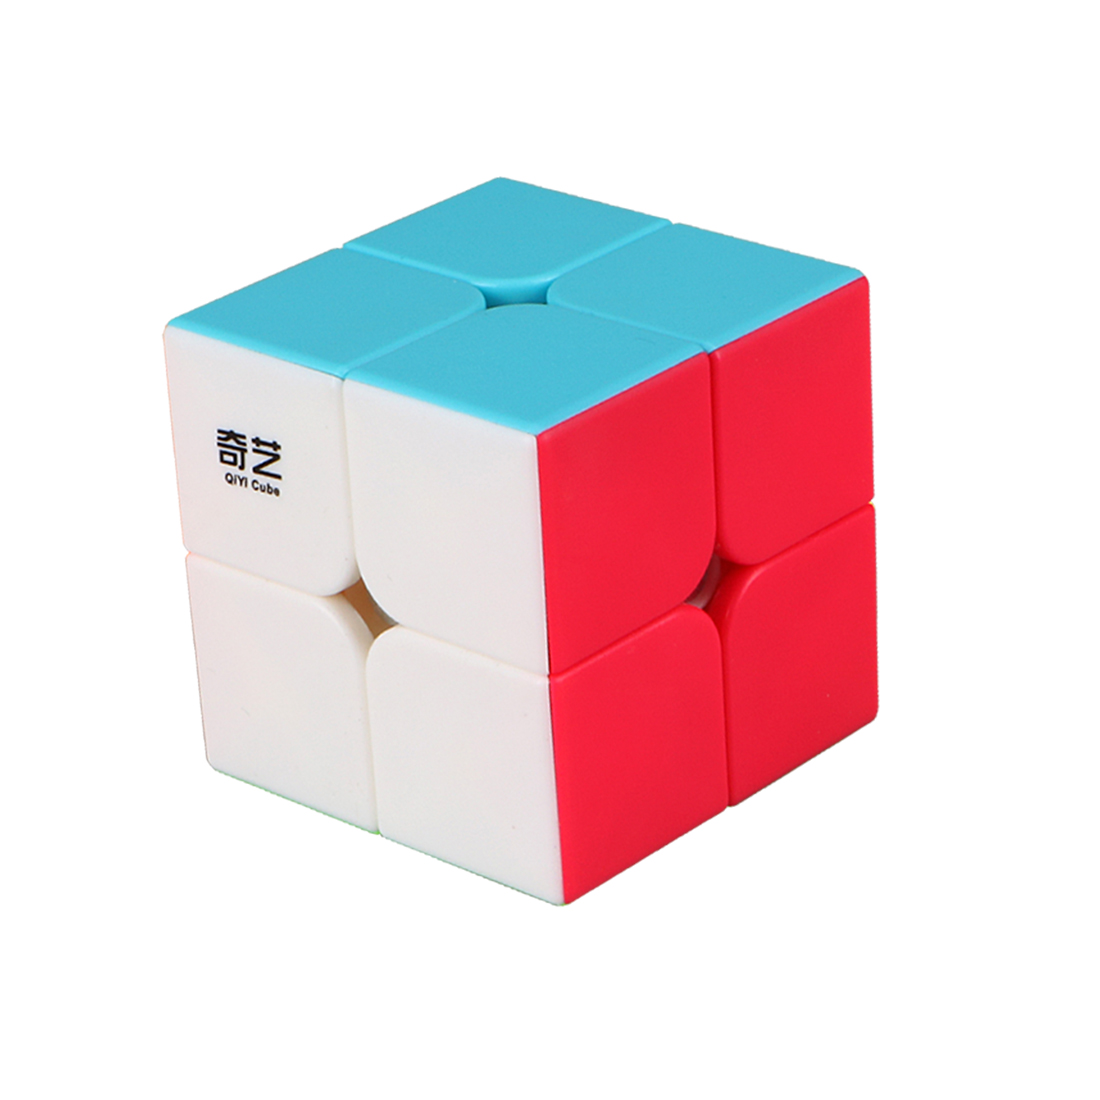 Qiyi QiDi S 2x2 Magic Cube Speed Cube Toy For Kids Boys 2019